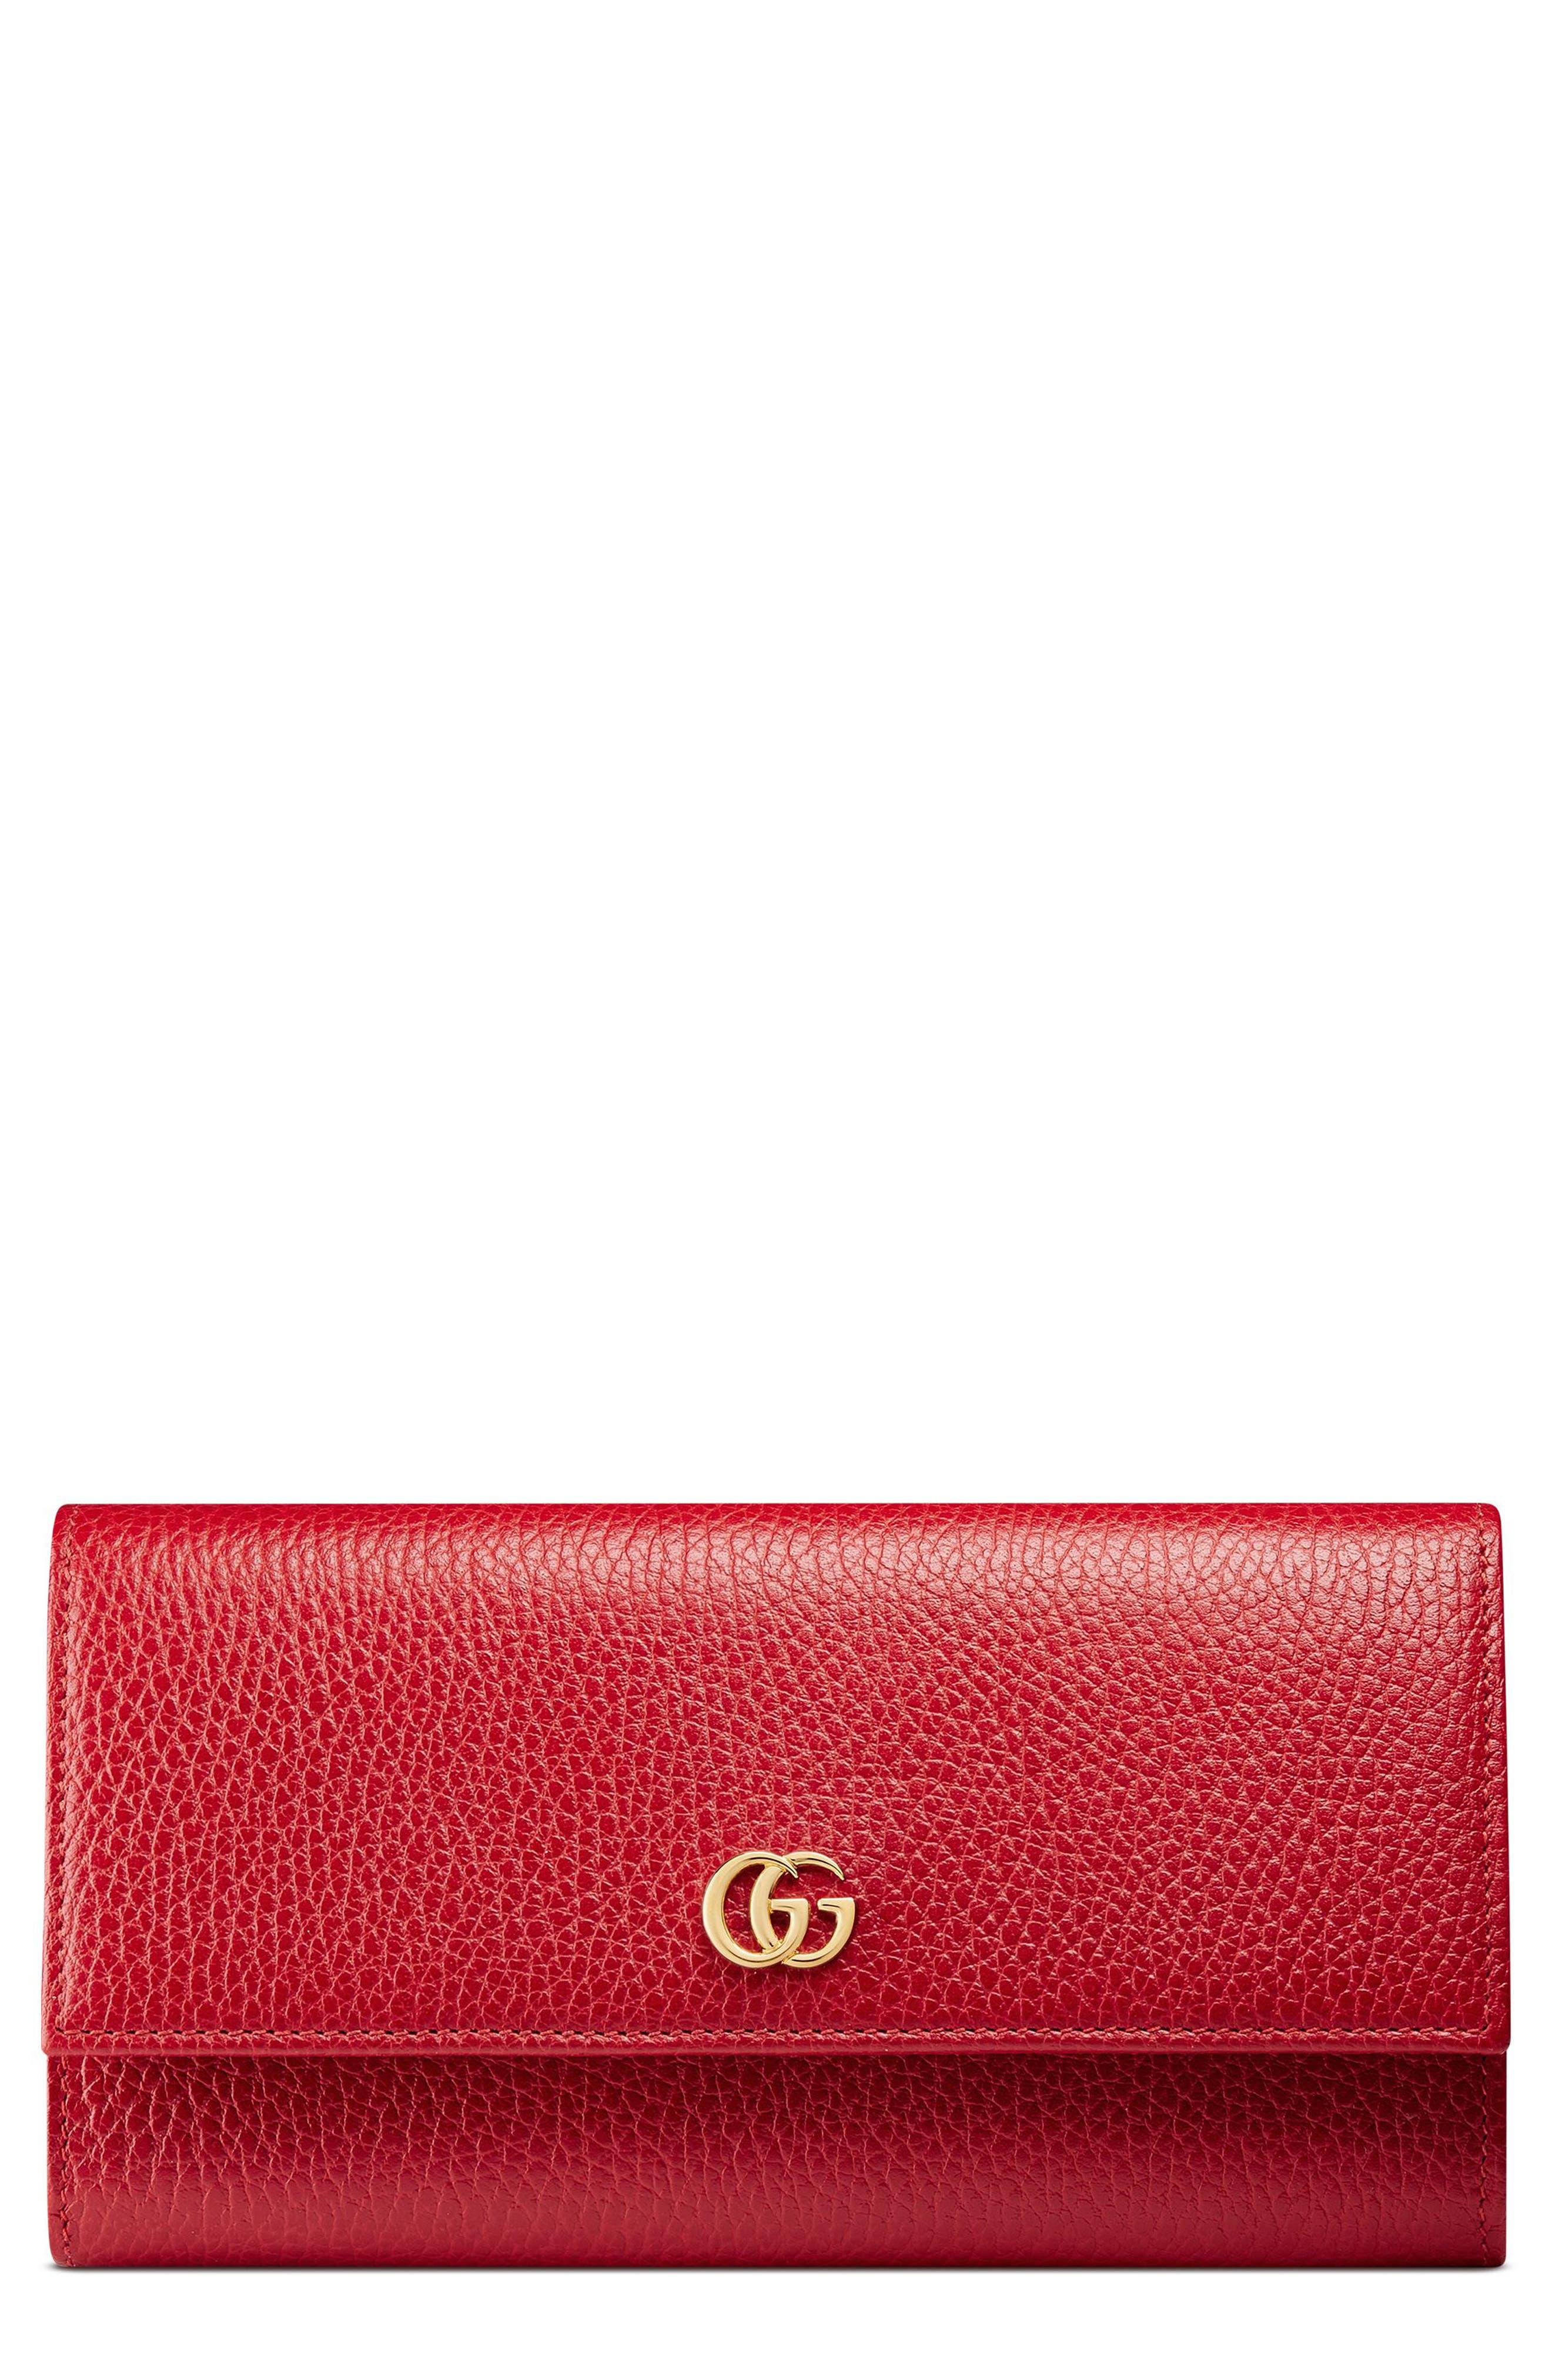 2aaac99b6fbb Gucci Women's $500 – $750 Handbags, Purses & Wallets | Nordstrom